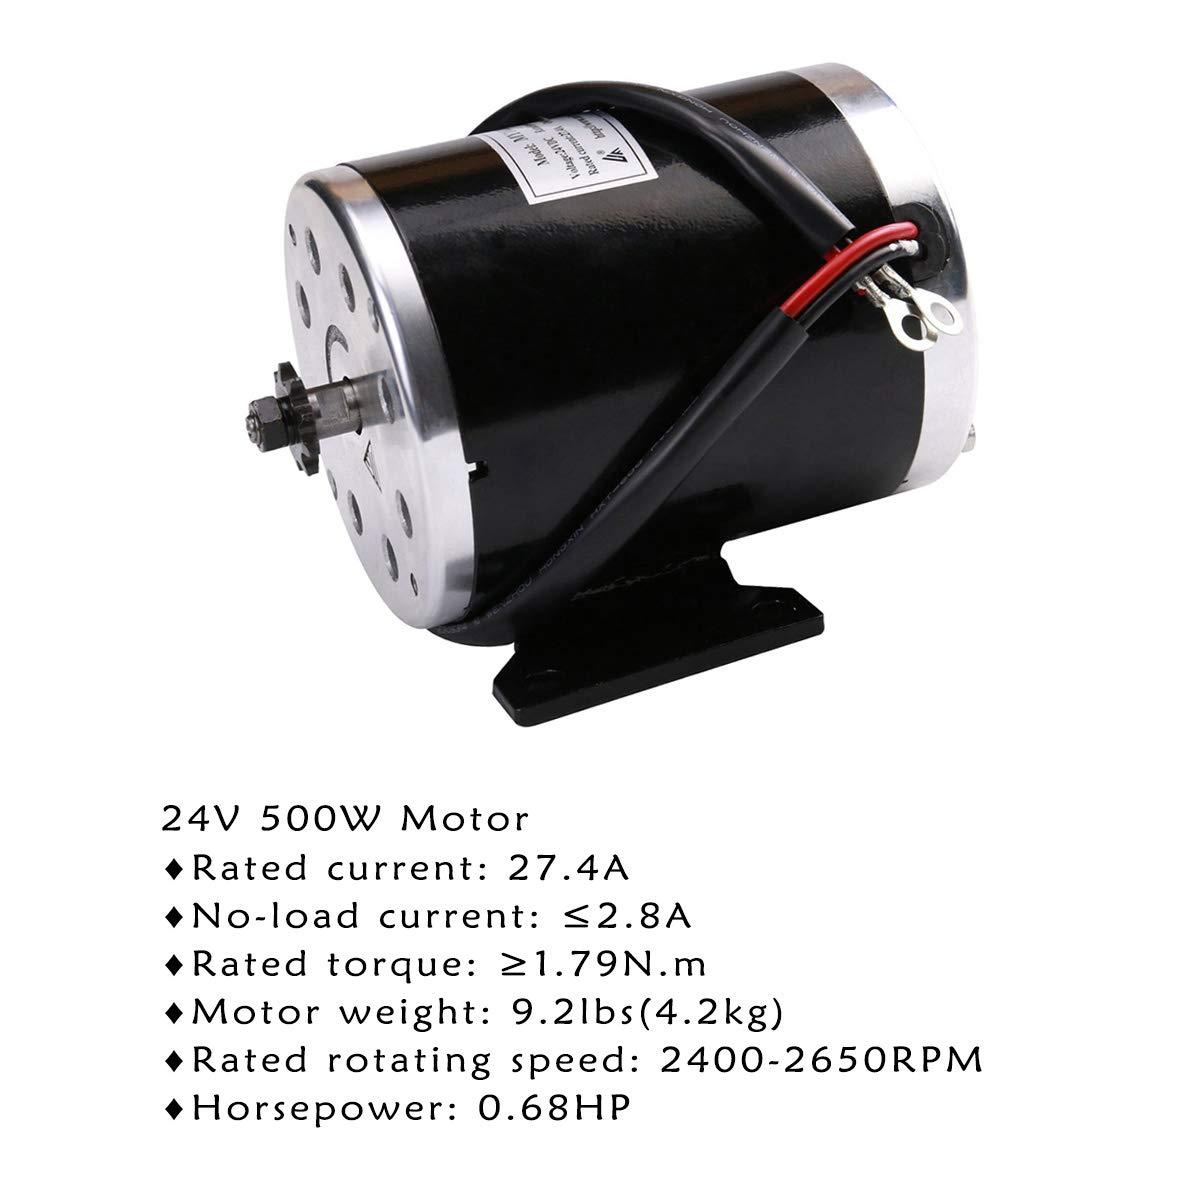 Amazon.com: tdpro 24 V 500 W cepillo para polvo Motor ...